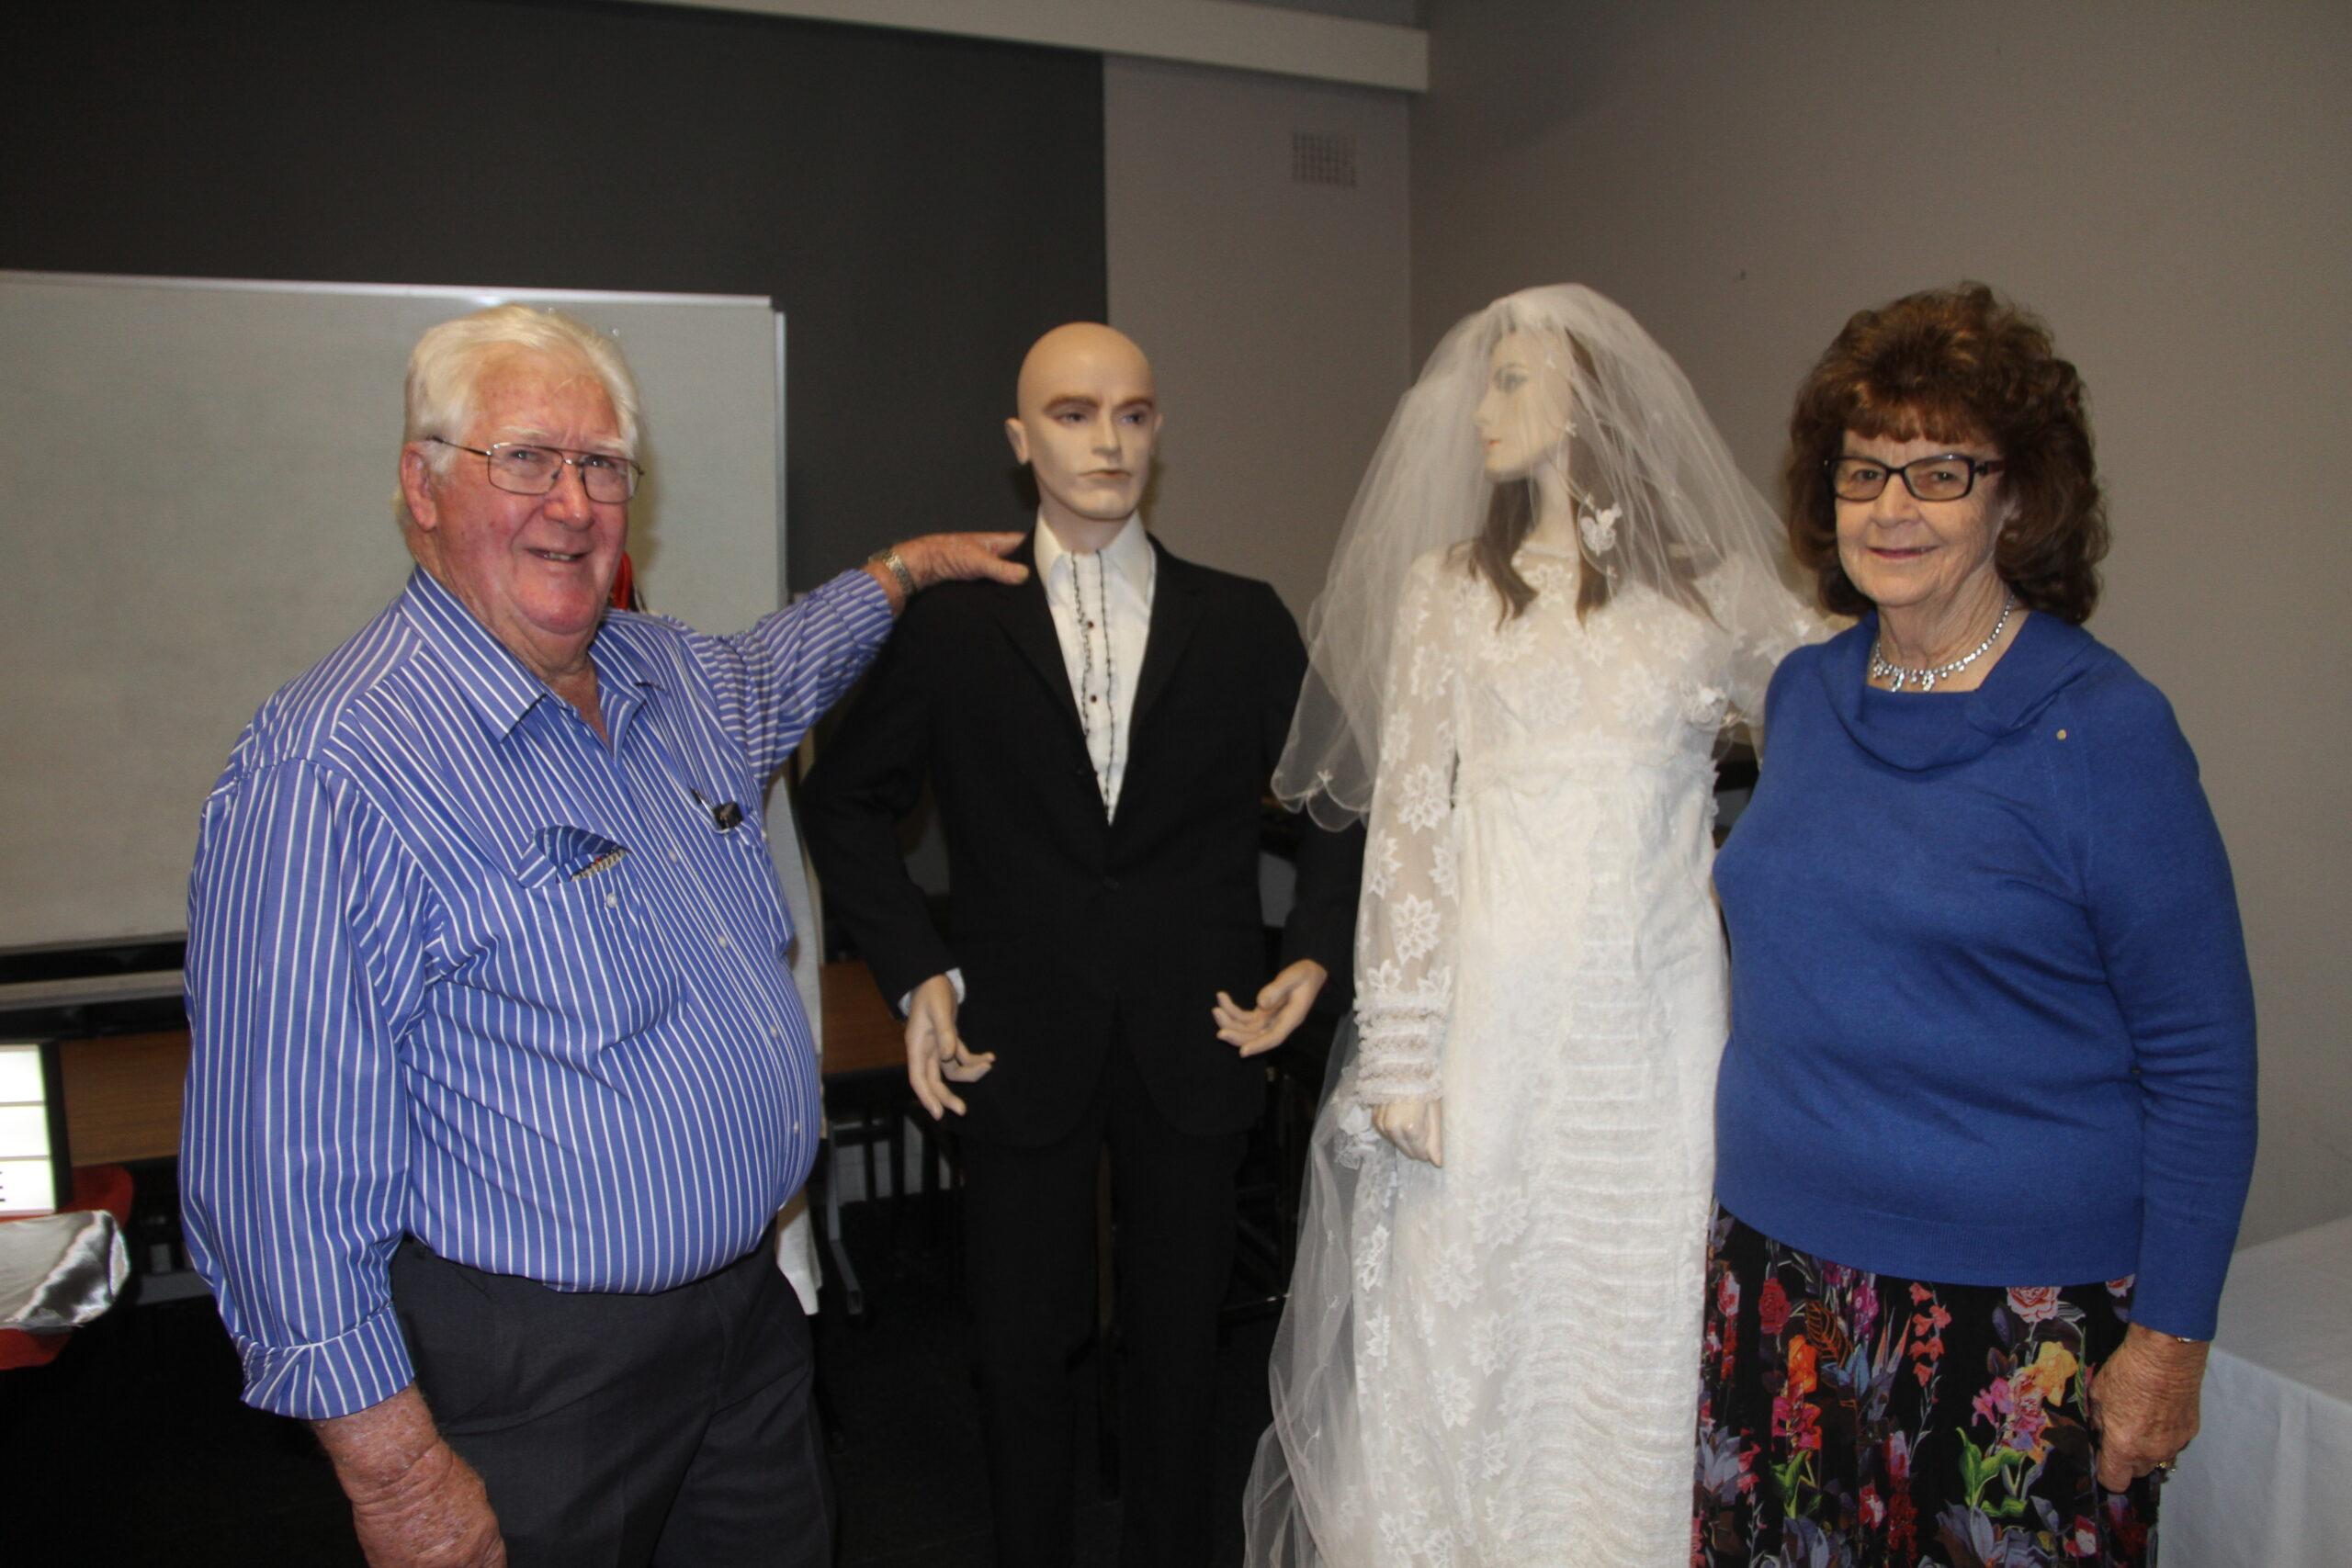 Garry and Diane Burr with their original wedding outfits.